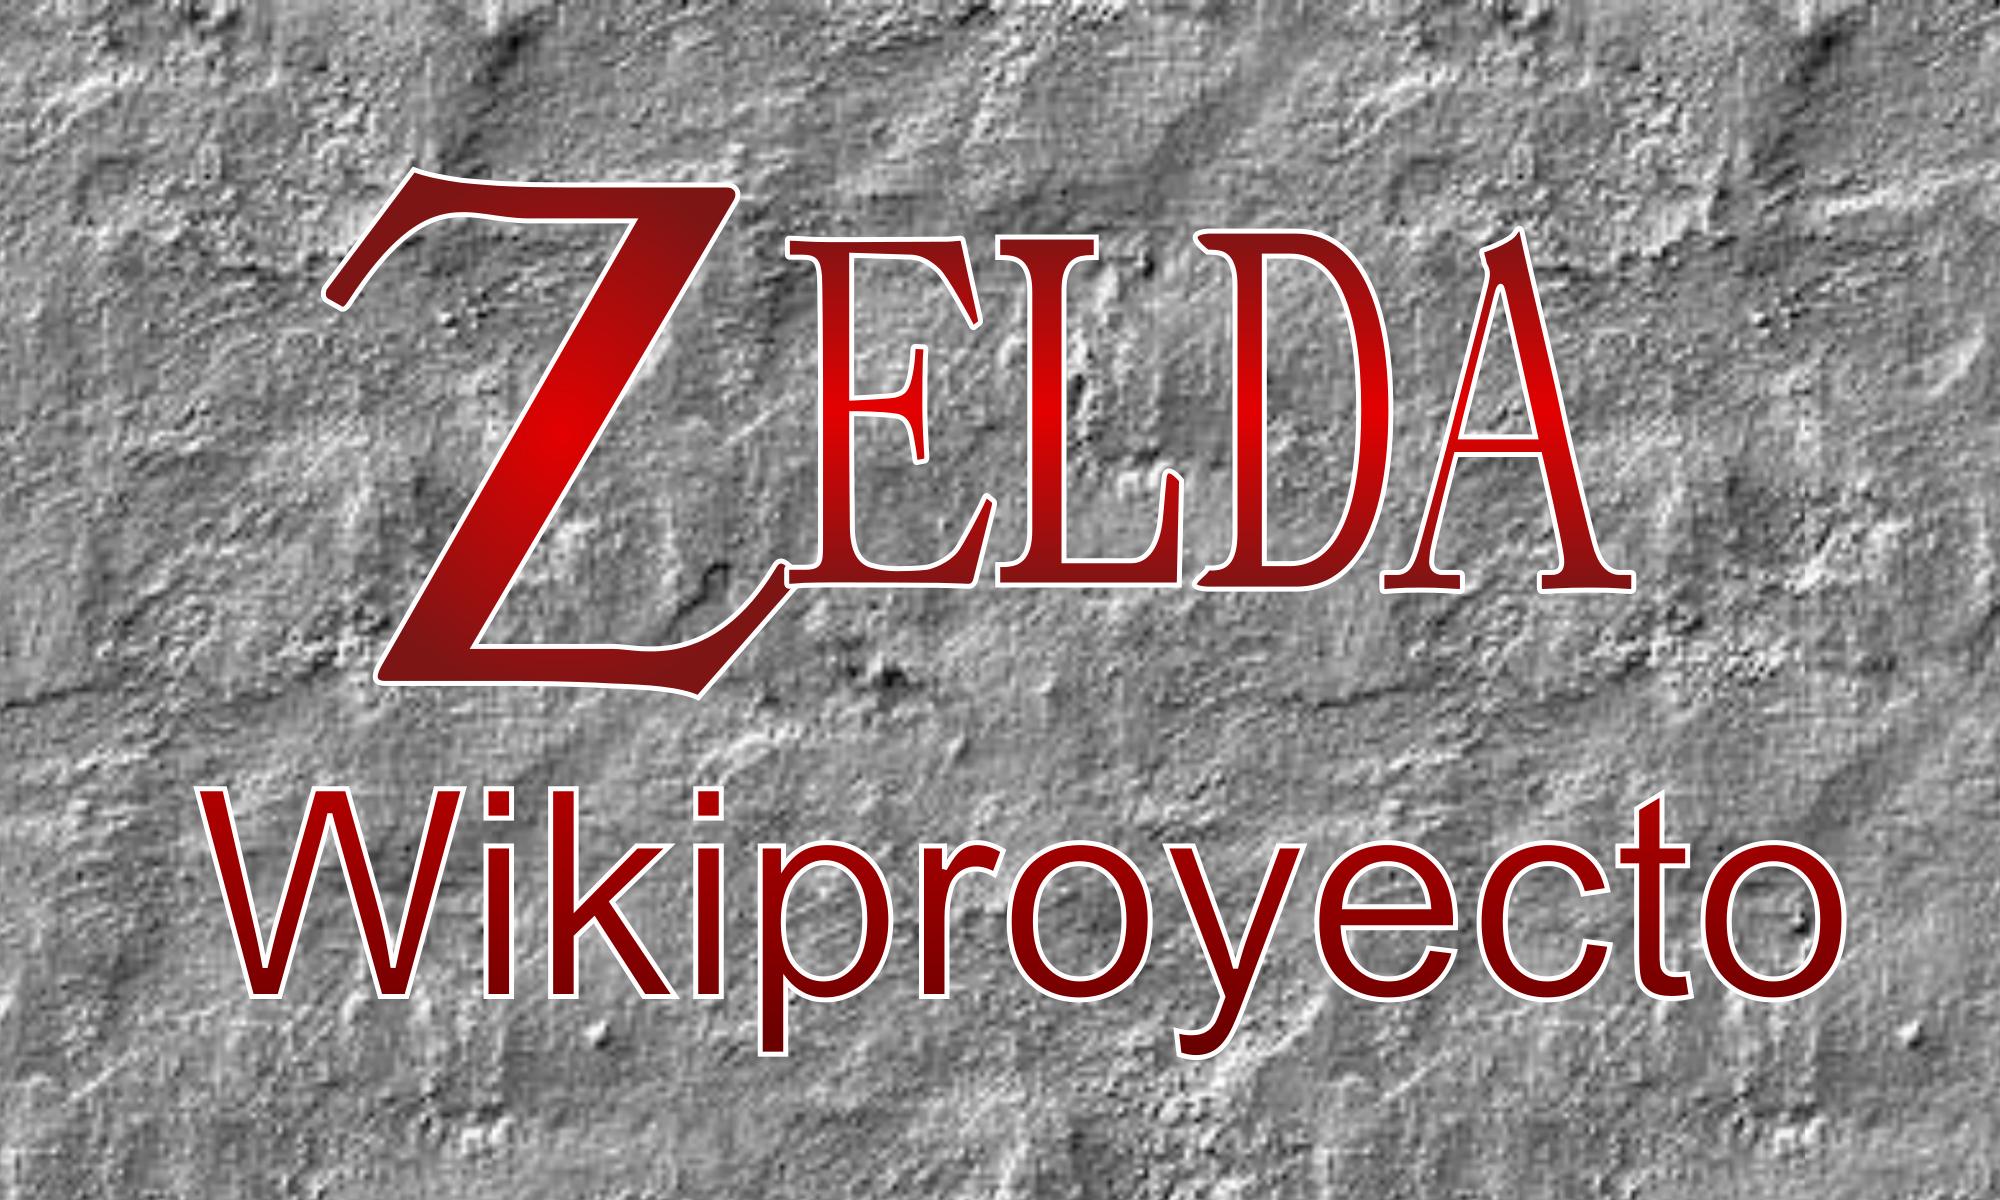 The Legend Of Zelda svg #5, Download drawings